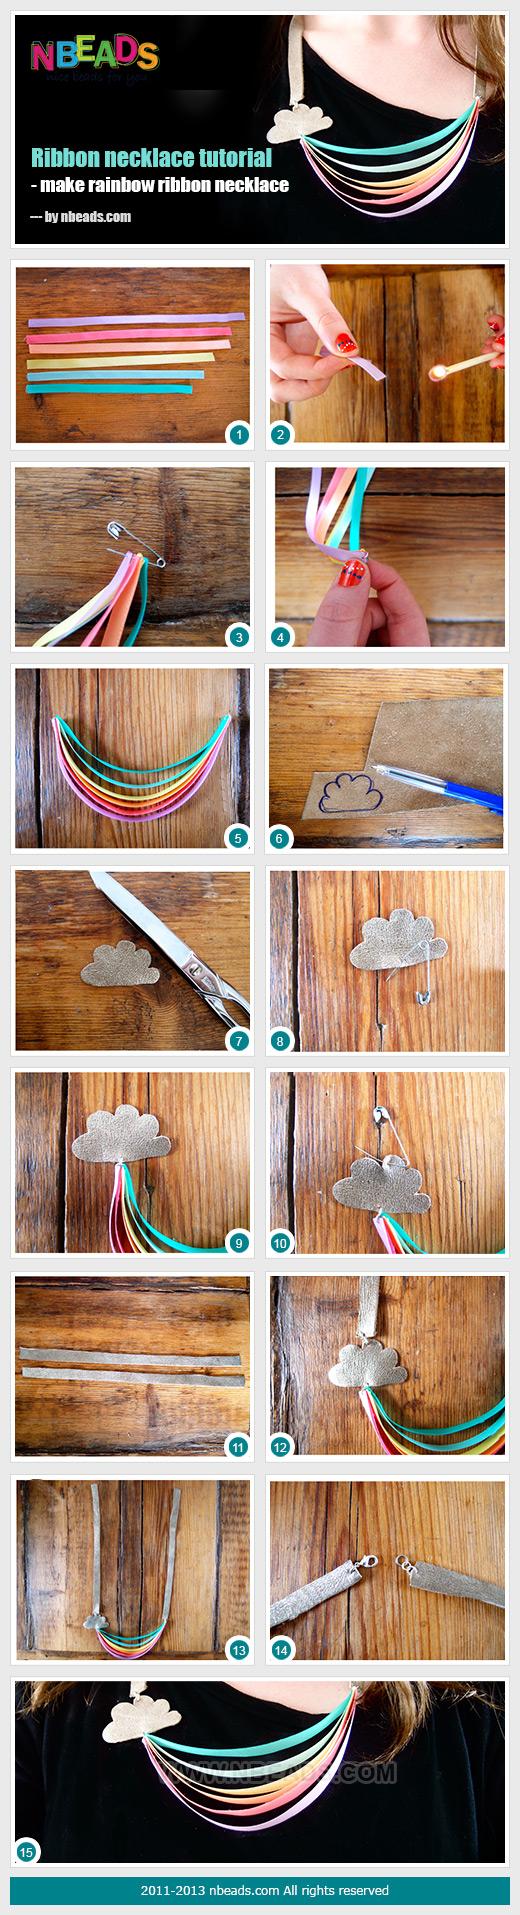 ribbon necklace tutorial - make rainbow ribbon necklace